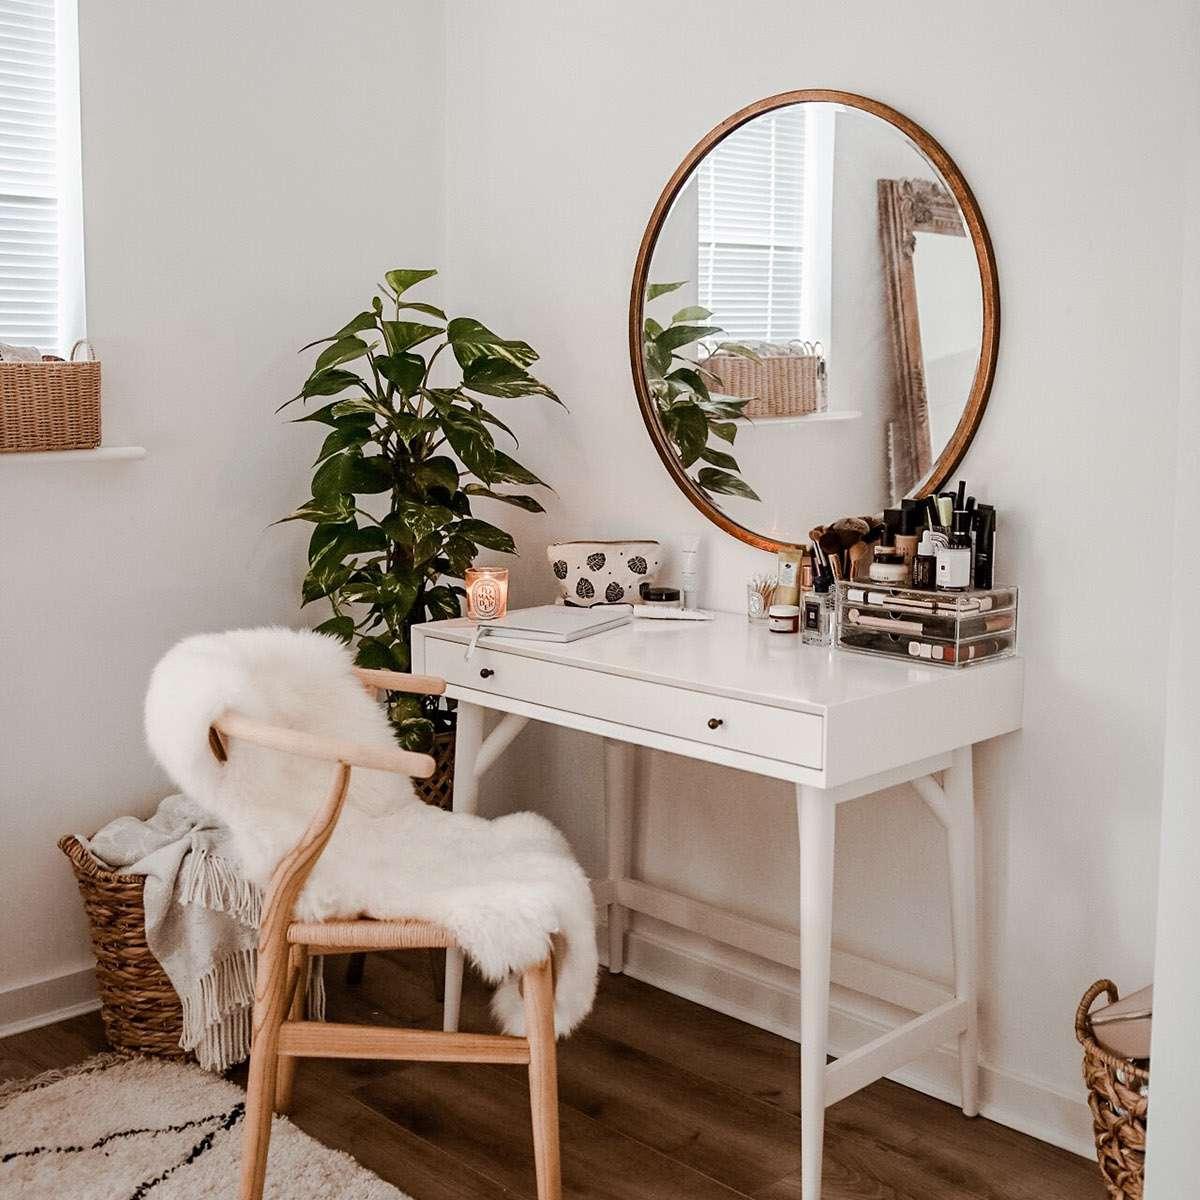 Sweet boho vanity with large round mirror and wishbone chair.